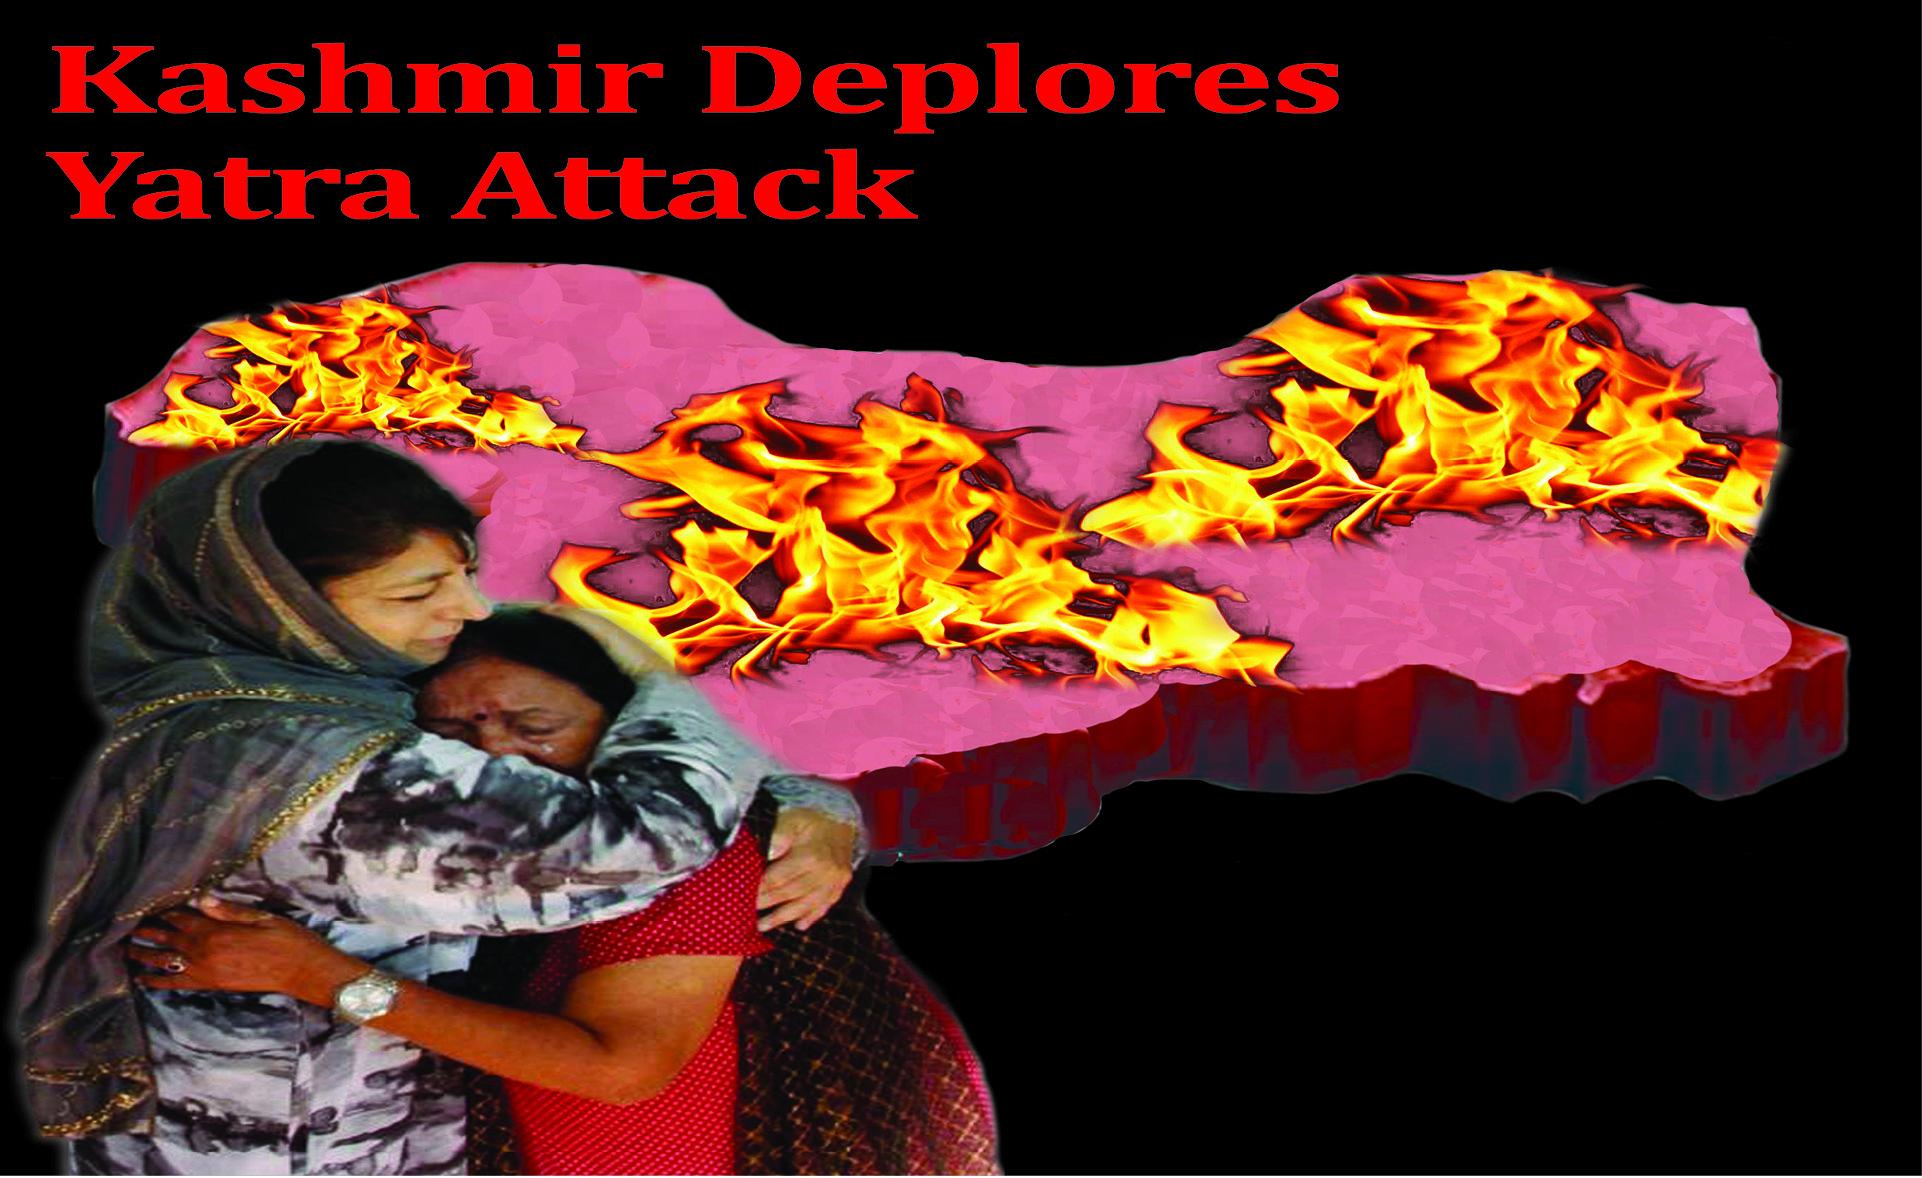 Kashmir Deplores Yatra Attack